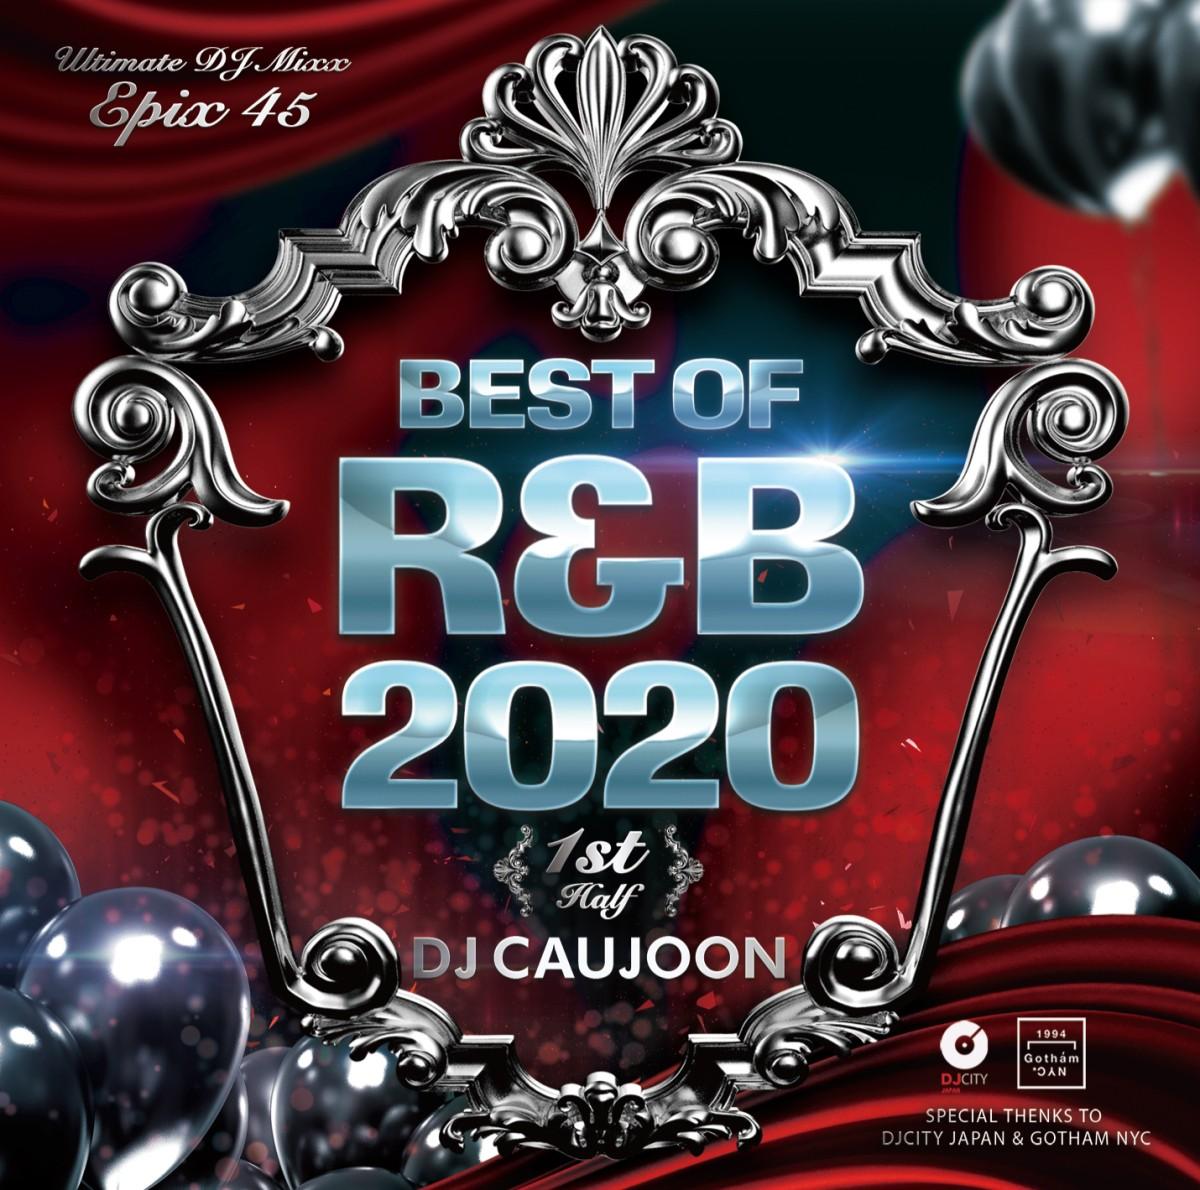 DJコージュン 2020 上半期 ベスト R&B 永久保存版 待望のベスト デュアリパ ザ・ウィークエンド など収録!Epix 45 -Best Of R&B 2020 1st Half- / DJ Caujoon